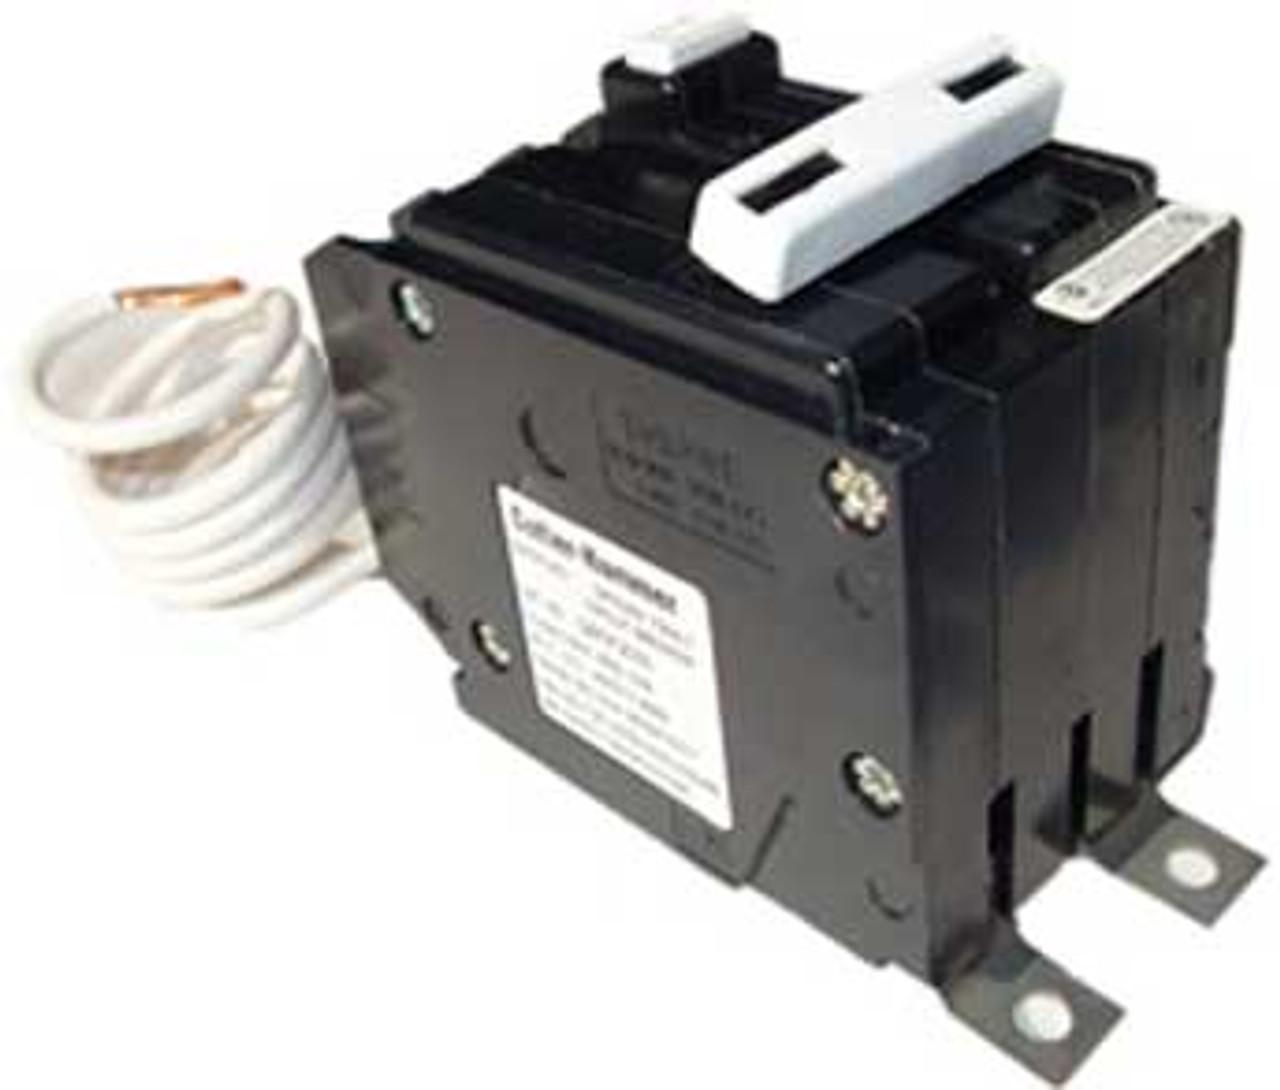 Cutler Hammer QBGF2025 2 Pole 25 Amp 240VAC GFI Circuit Breaker - New Pullout